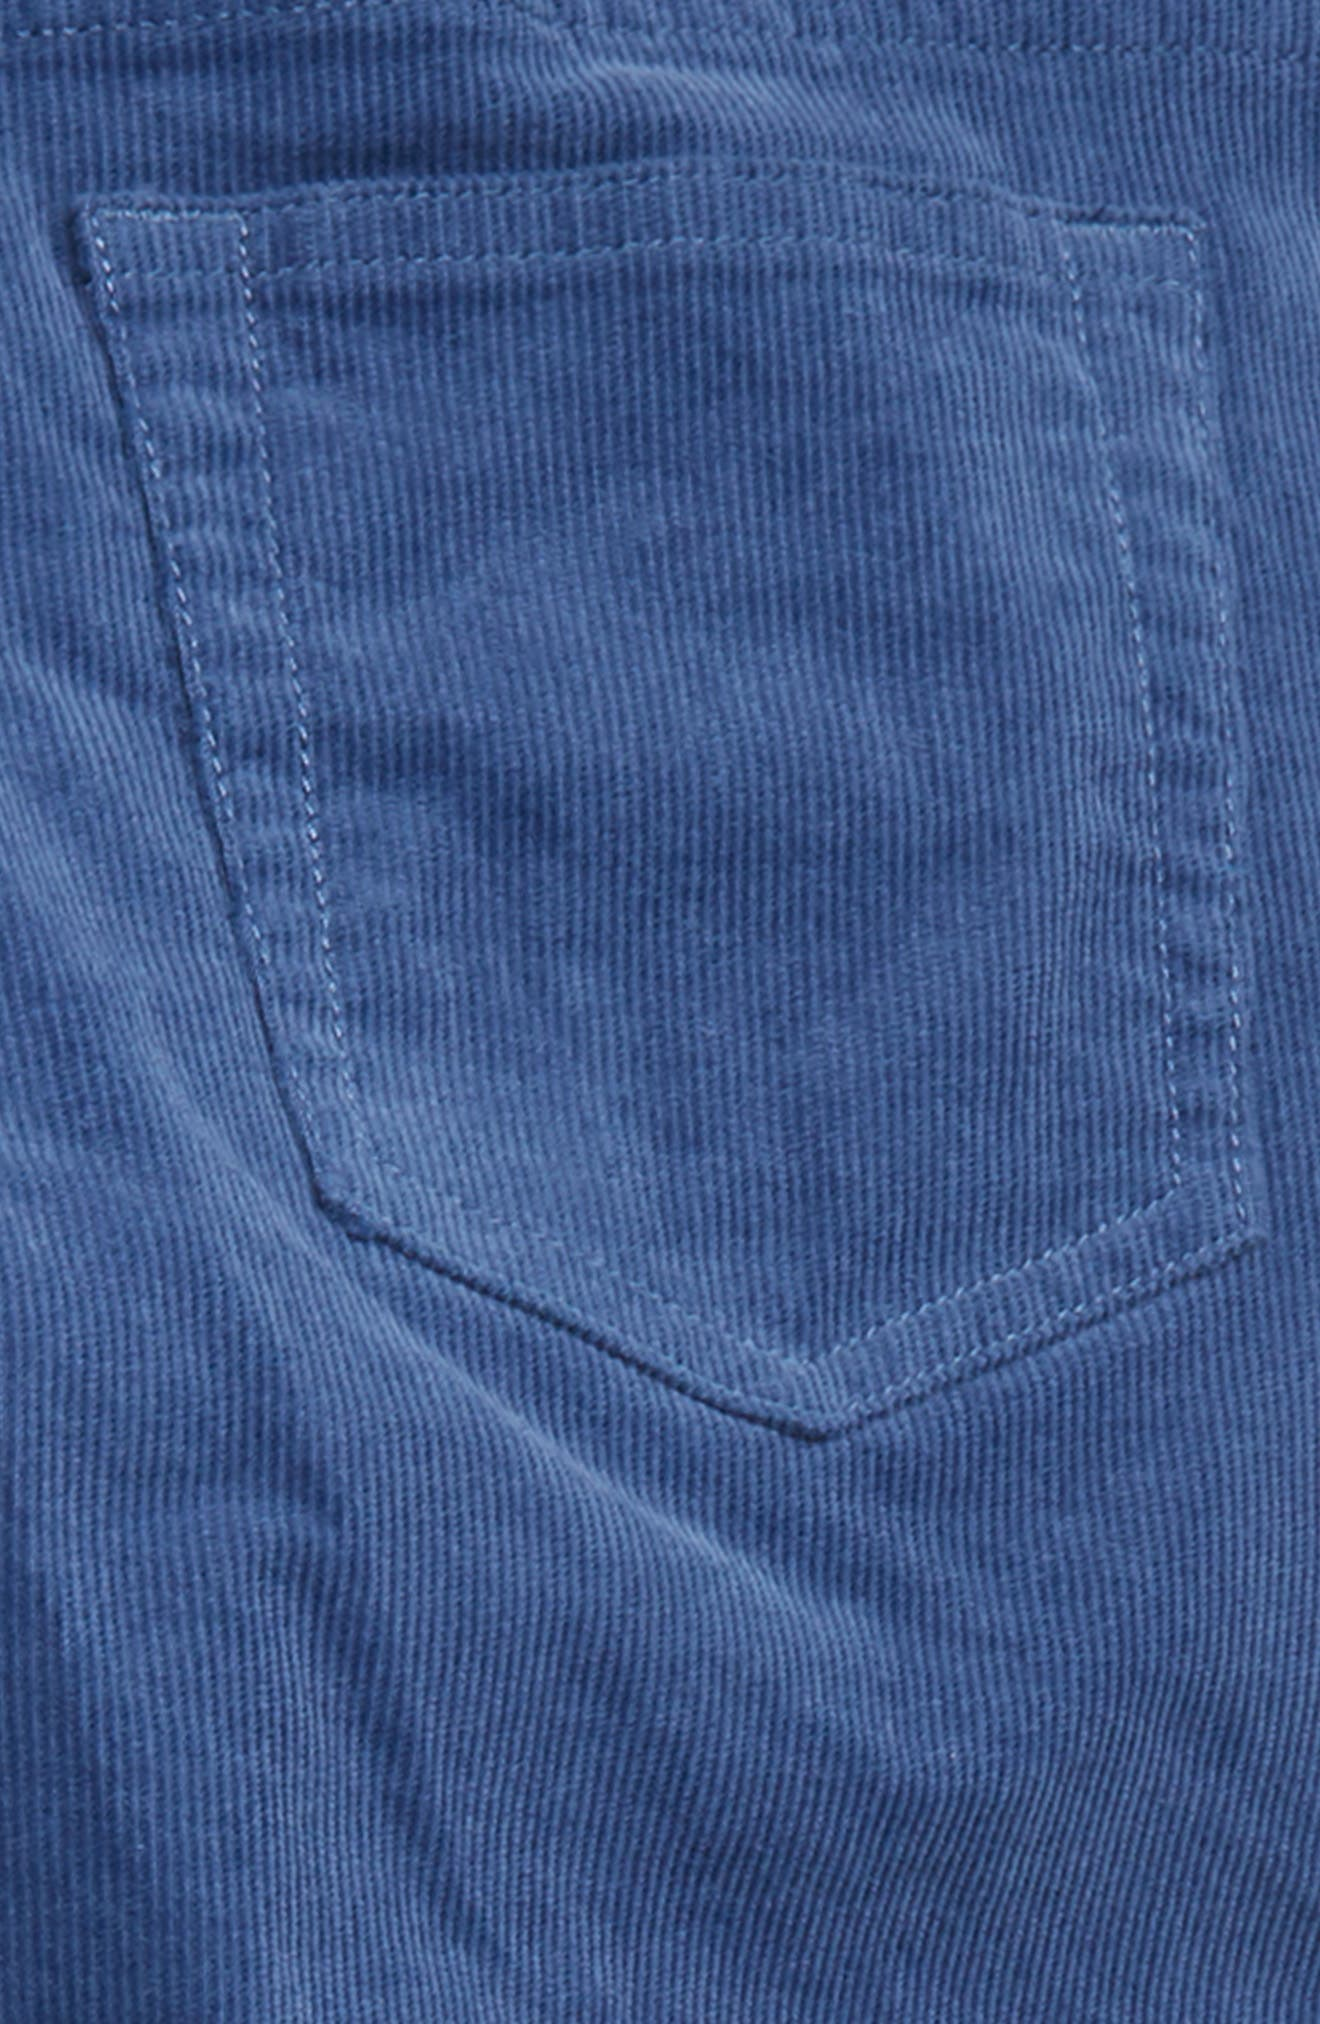 Corduroy Pants,                             Alternate thumbnail 3, color,                             463